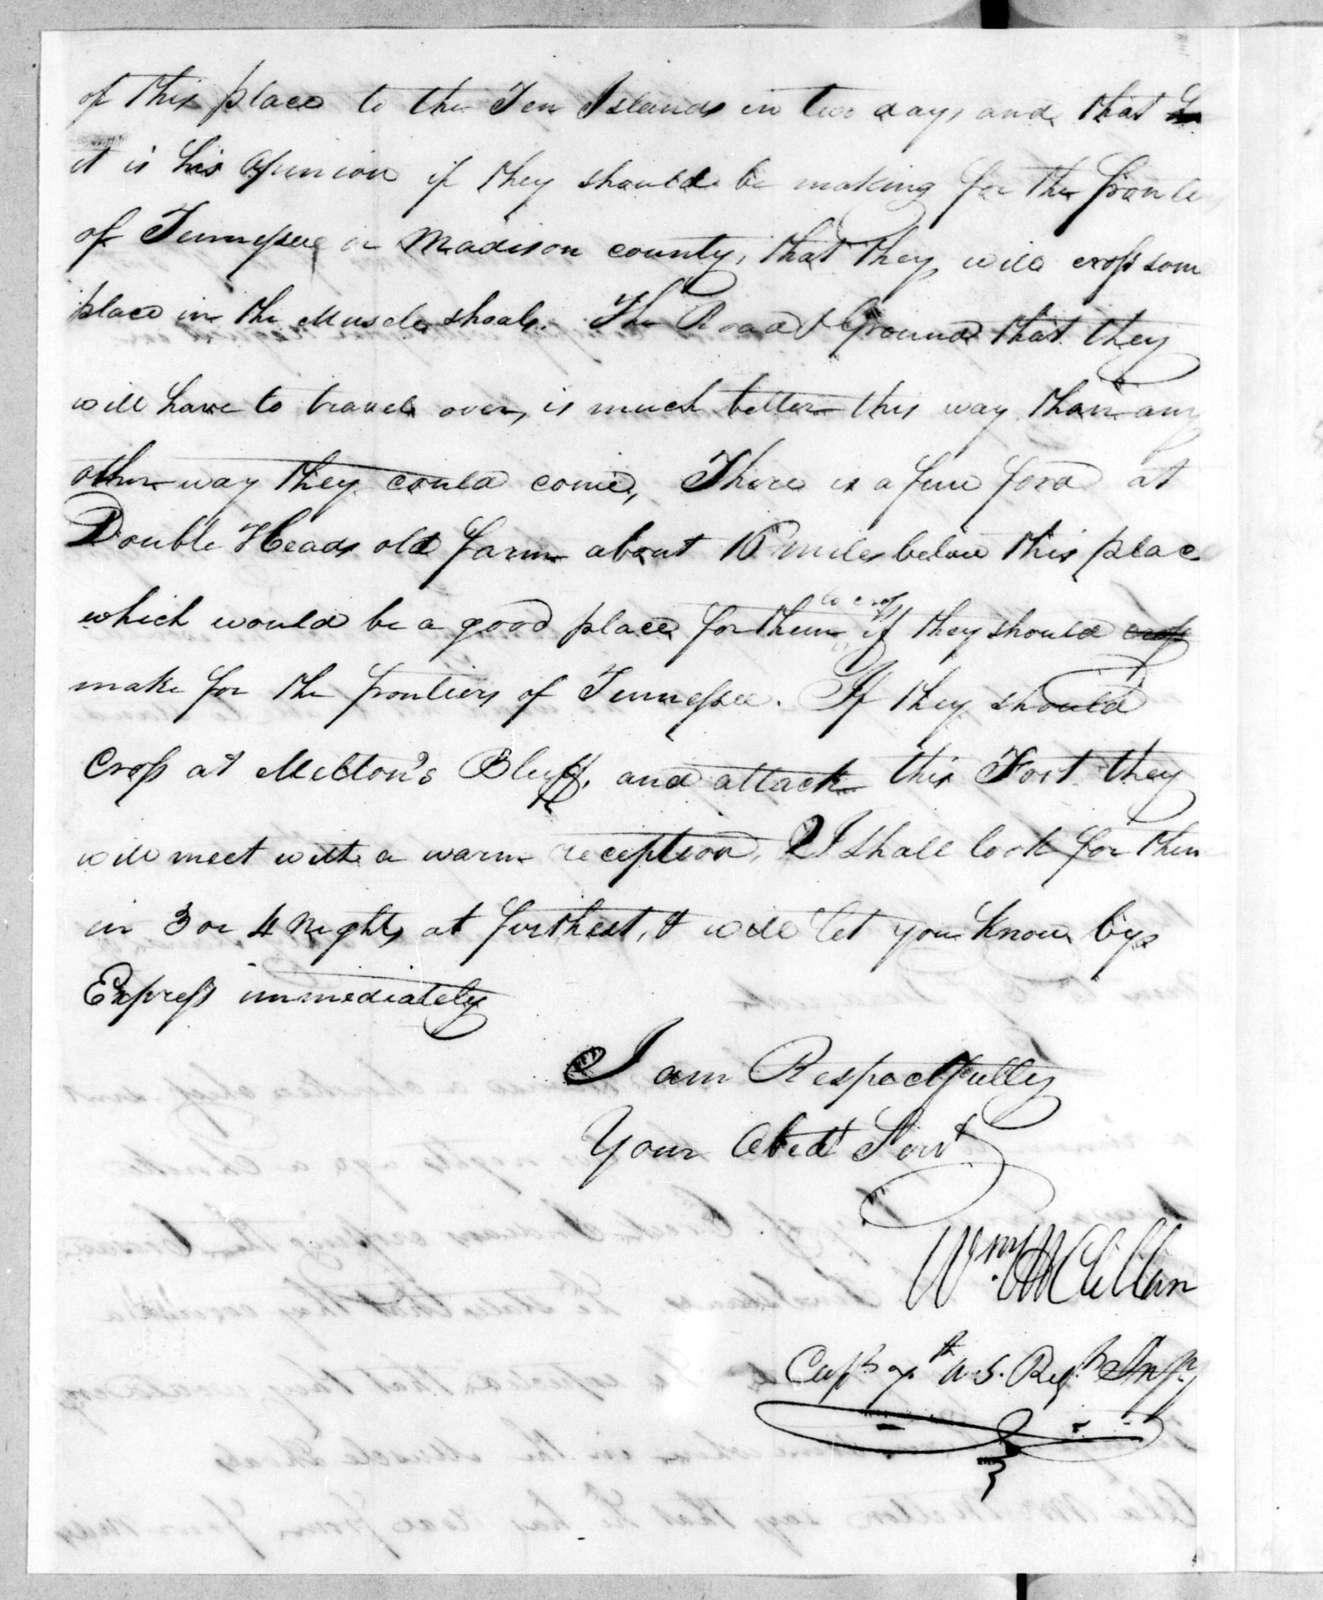 William McClellan to Andrew Jackson, October 13, 1813